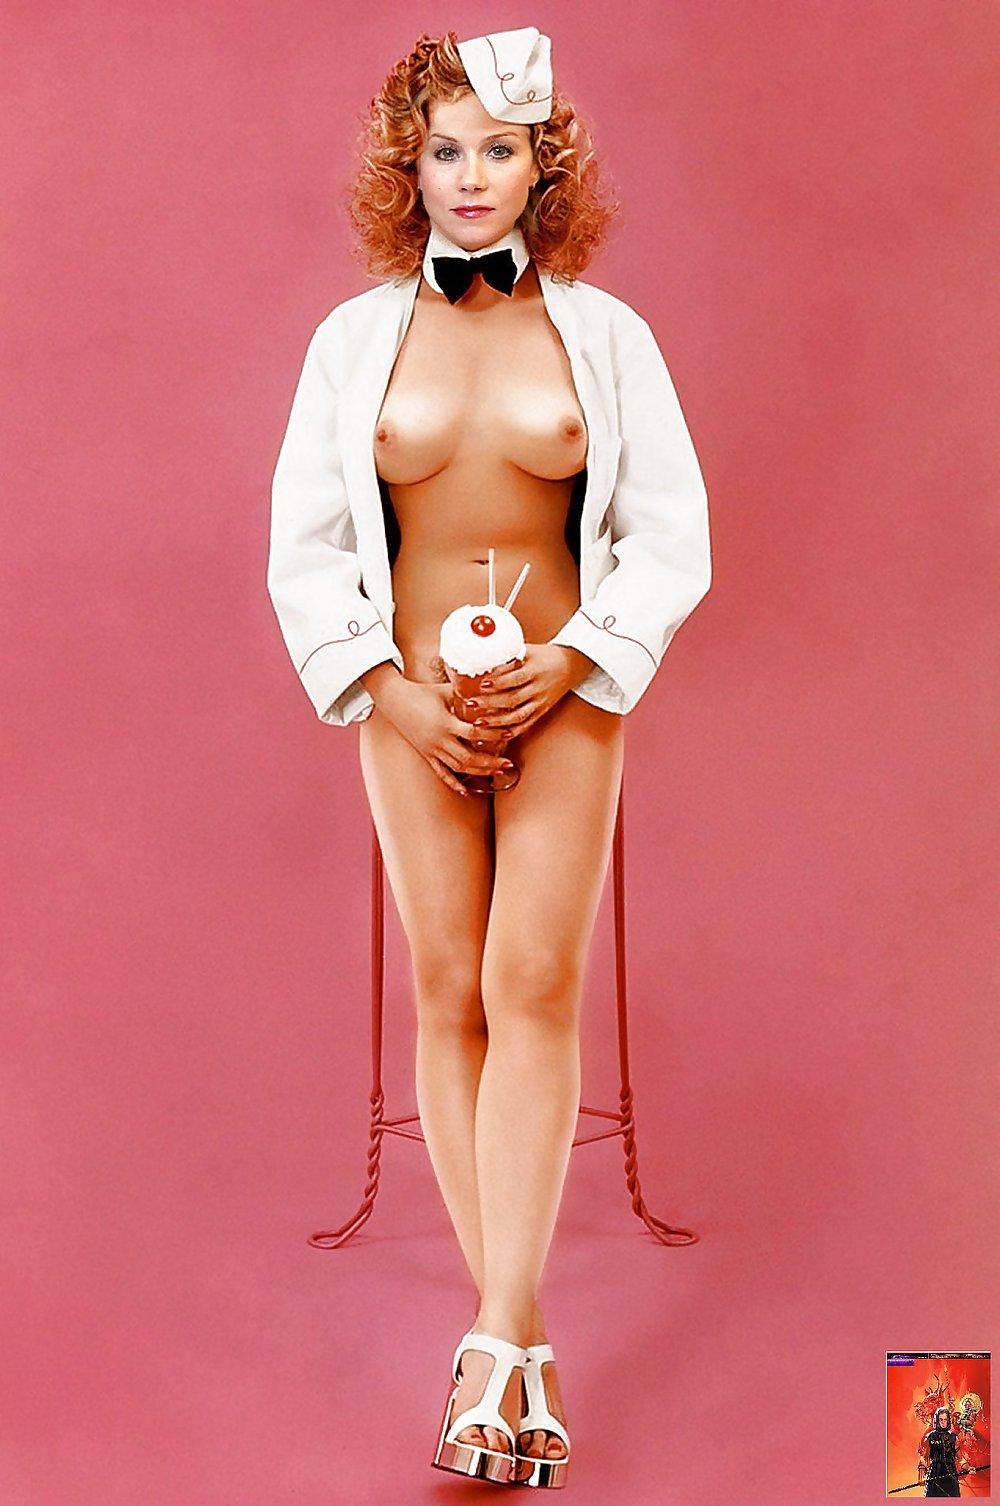 Christina applegate nude photos, photo clips bio